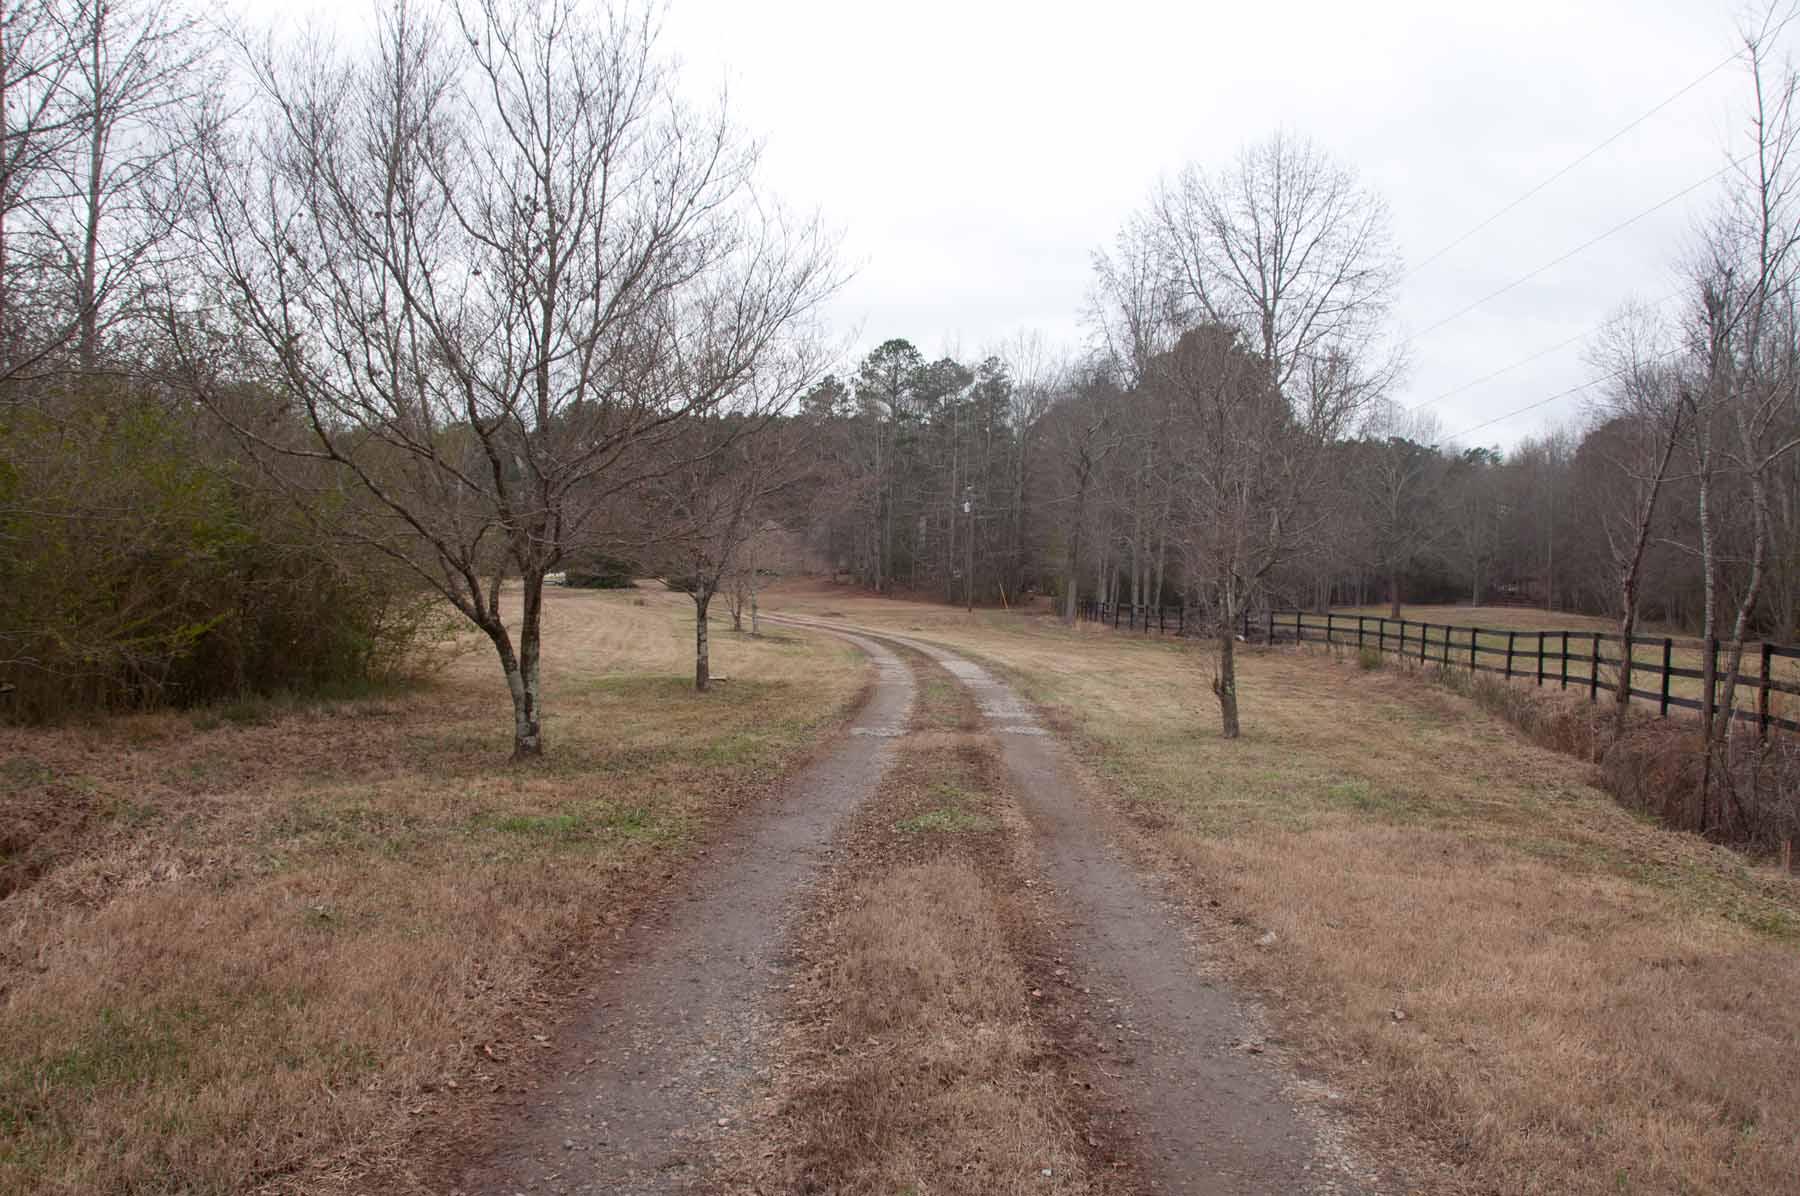 Terreno para Venda às Five and a Half Private Acres With Creek 5095 Karr Road Cumming, Geórgia, 30040 Estados Unidos